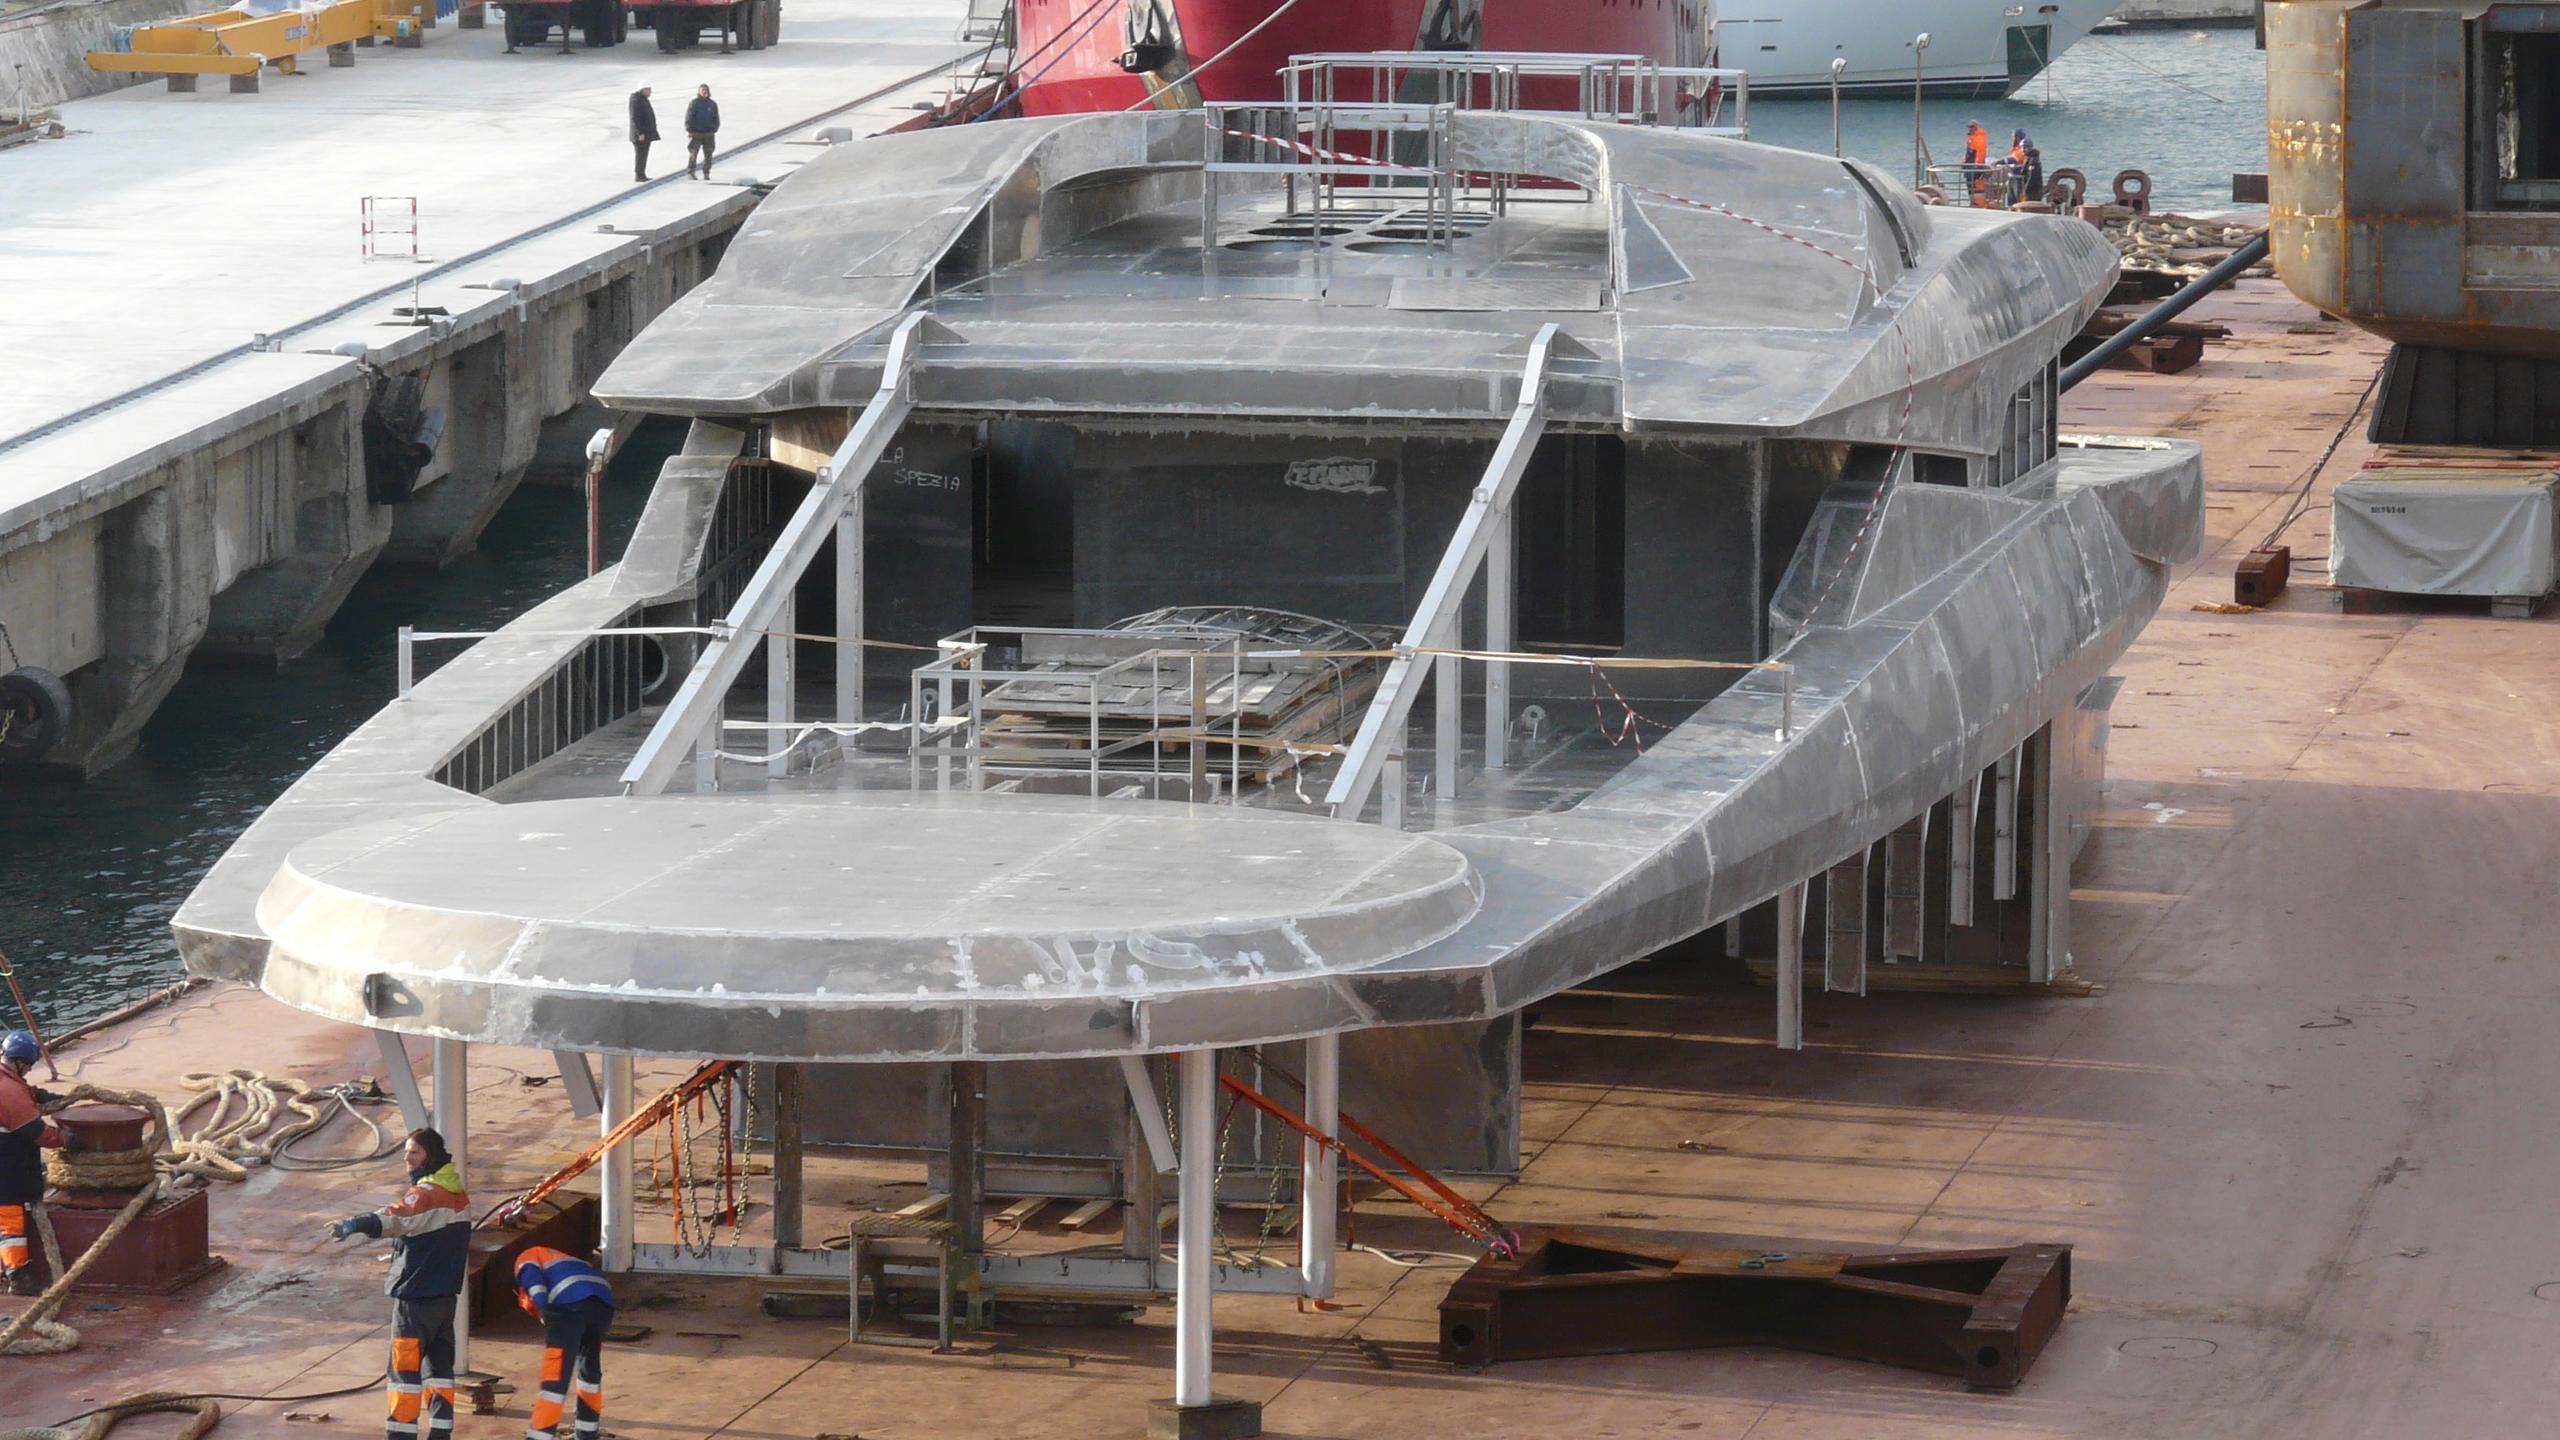 solo s701 motoryacht tankoa yachts 72m 2018 under construction superstructure